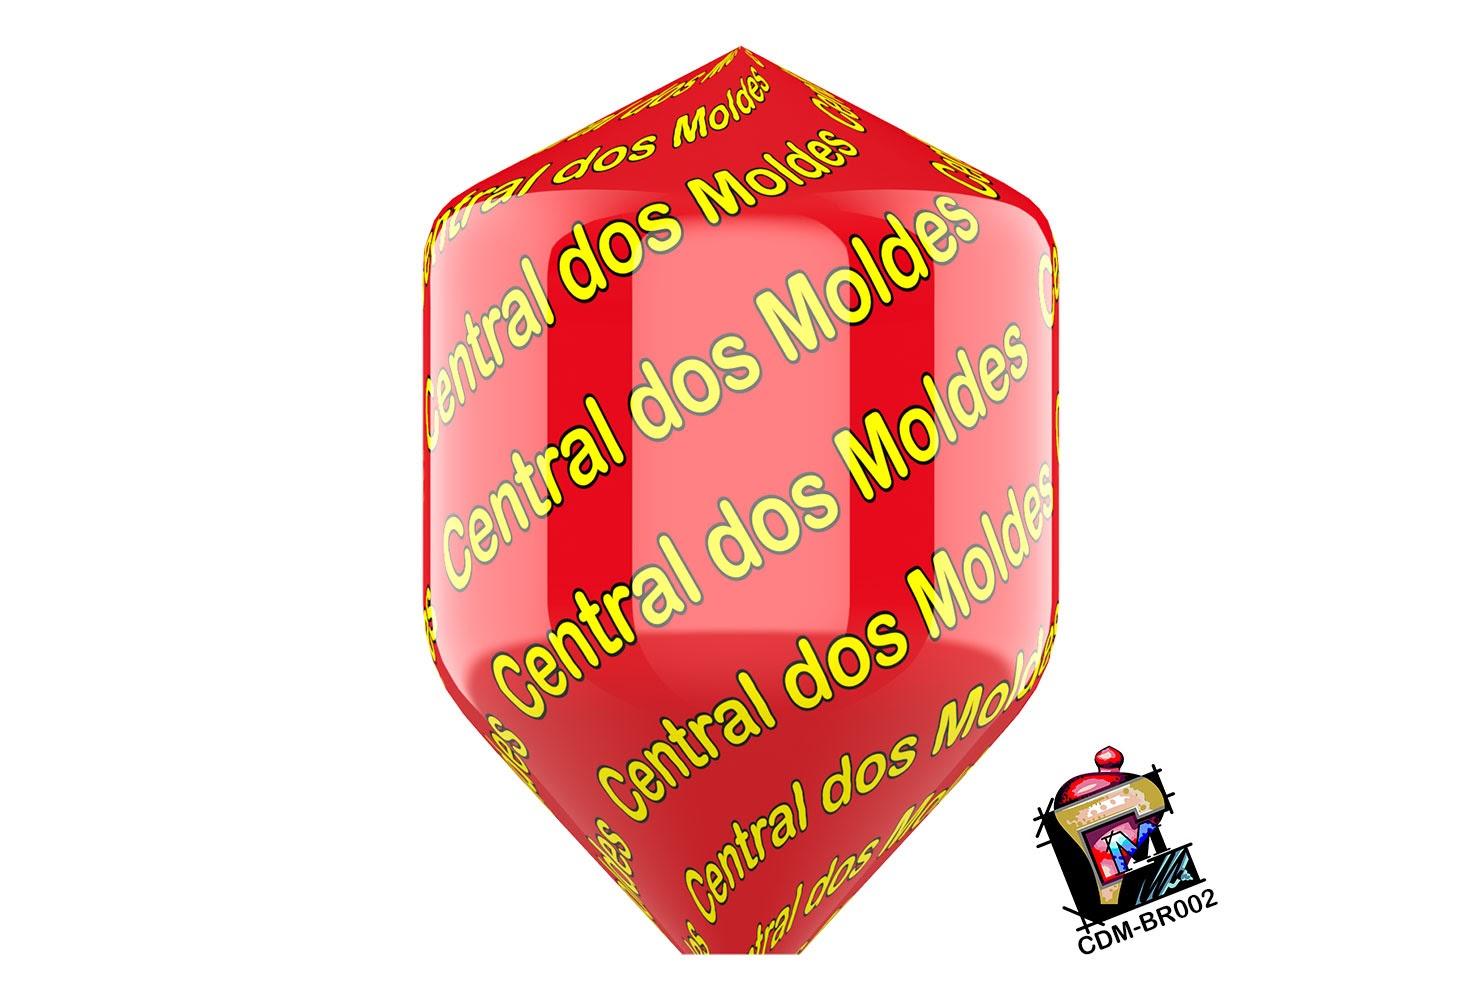 CDM-BR002-14092012 - Silhueta